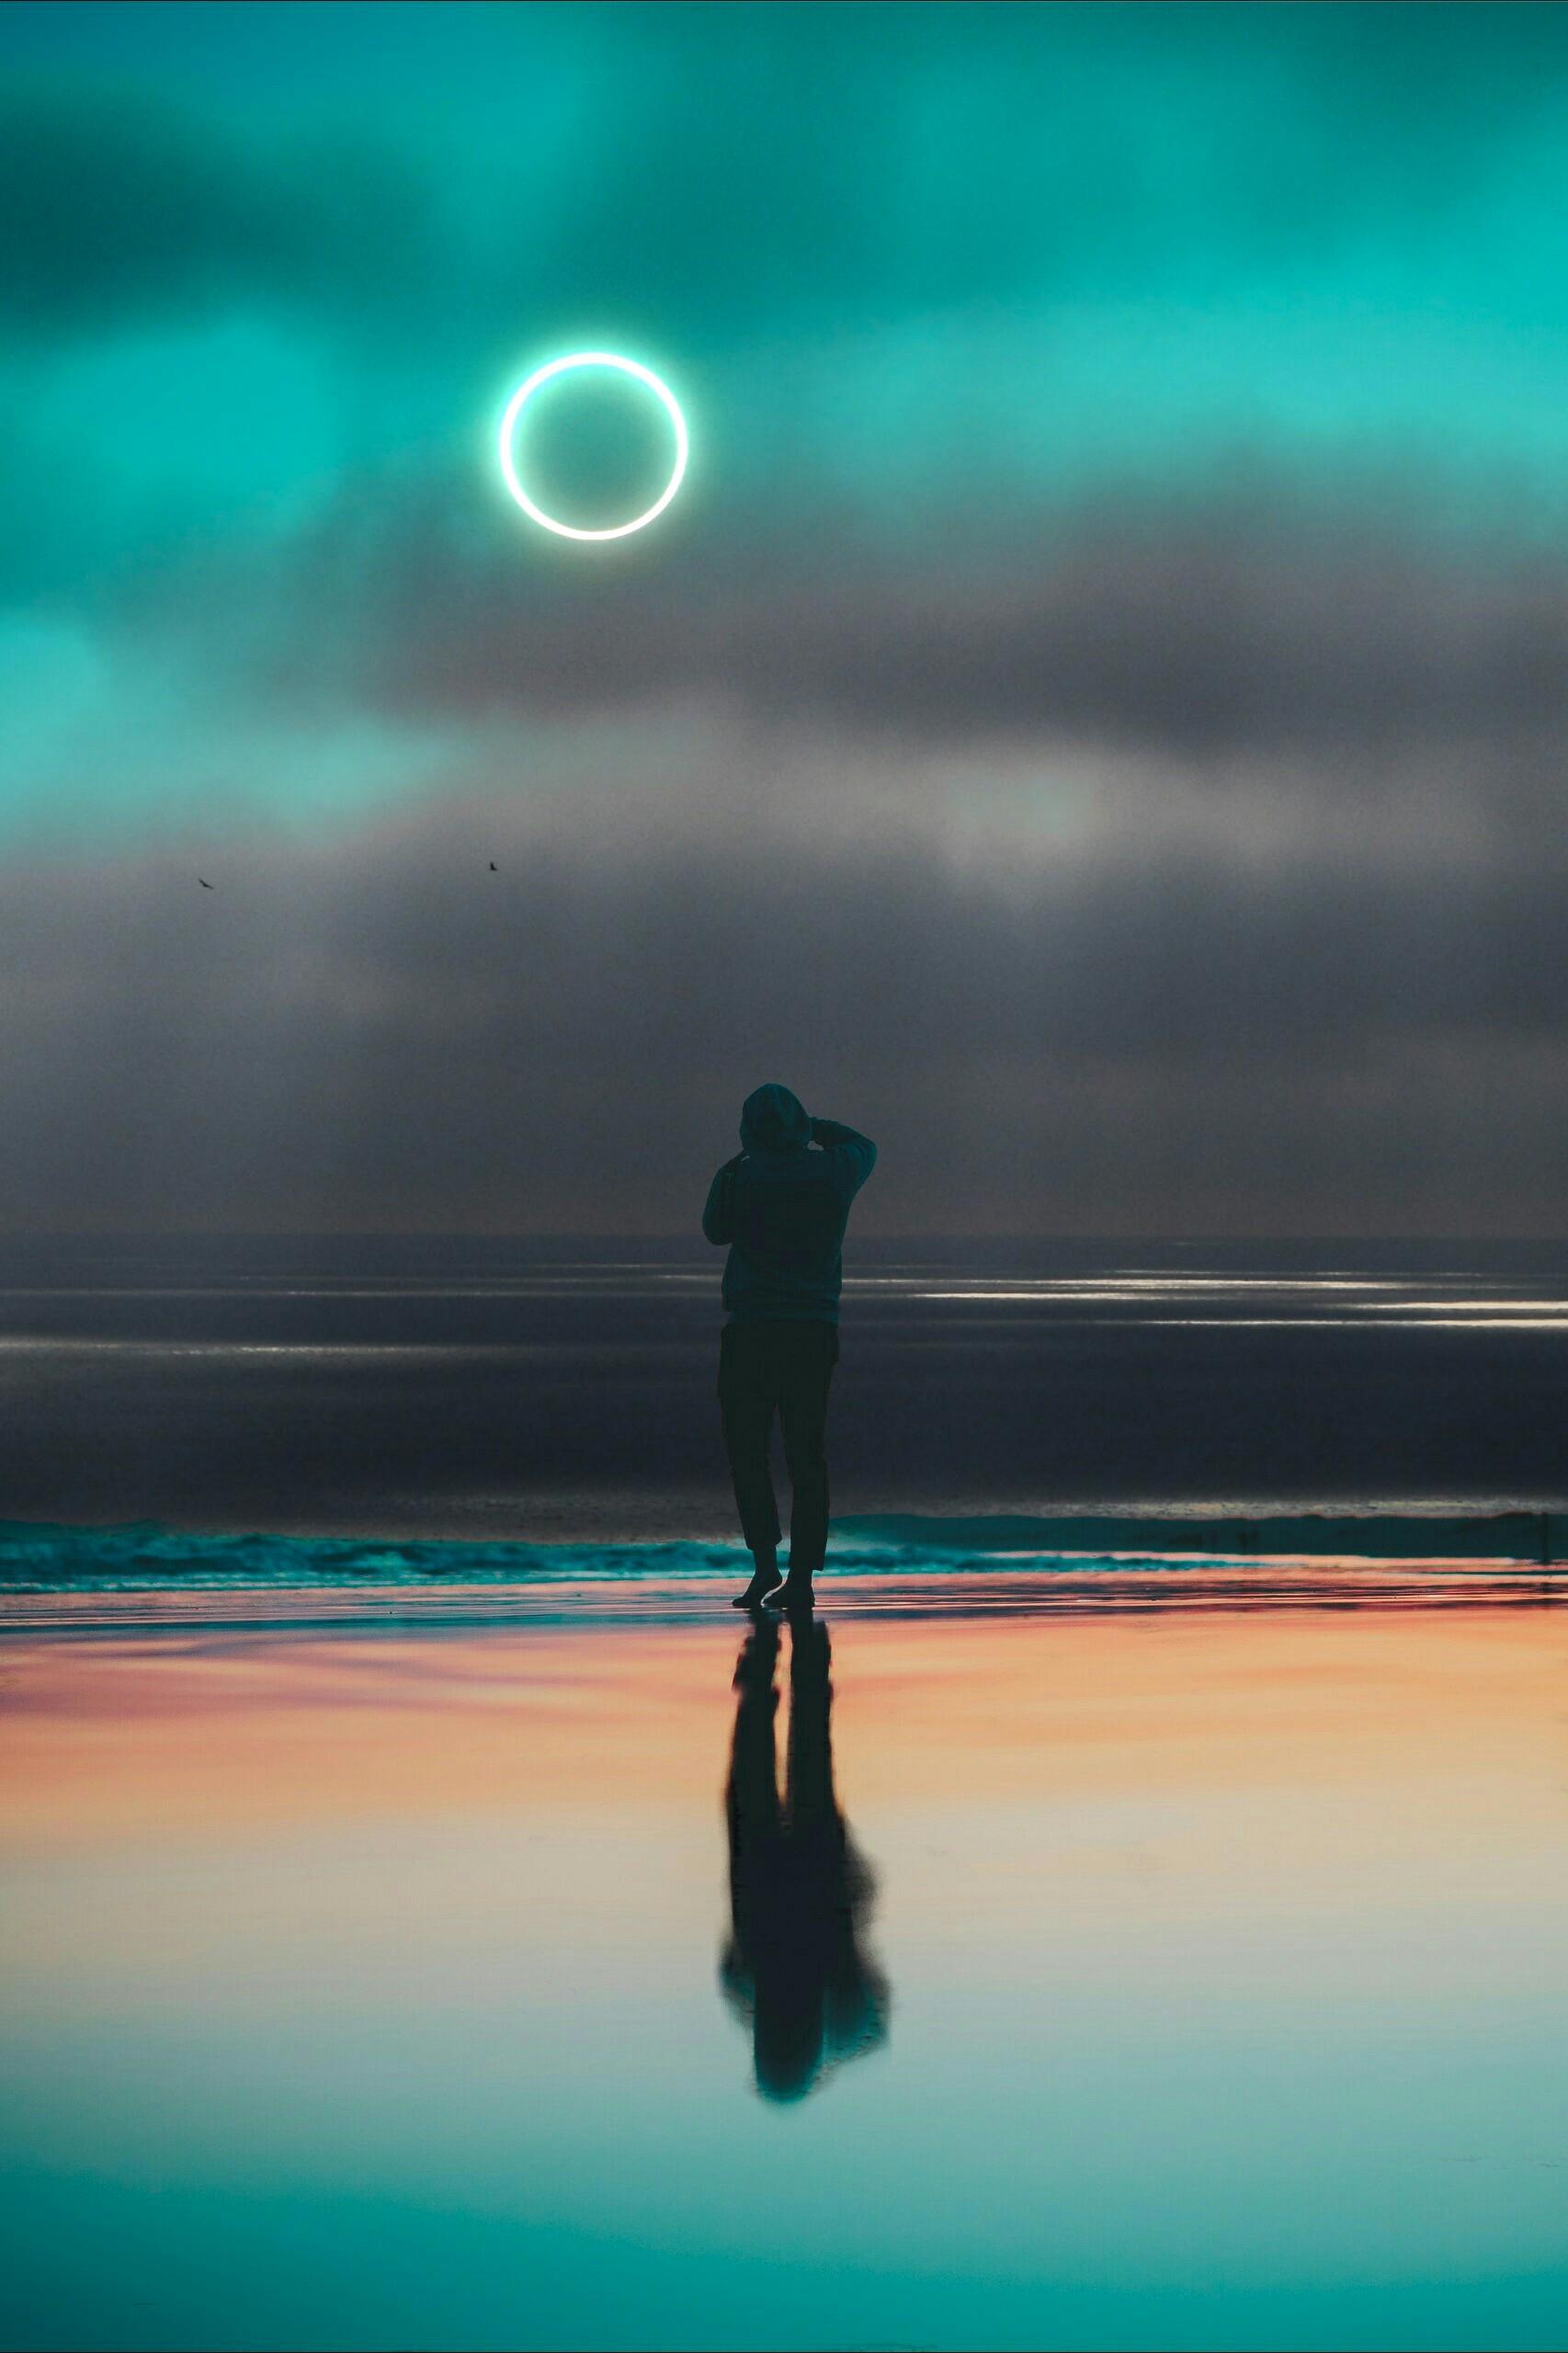 #eclipse2017 #eclipse #solareclipse #sky #dailyphotochallenge #draw #editstepbystep Thankyou!